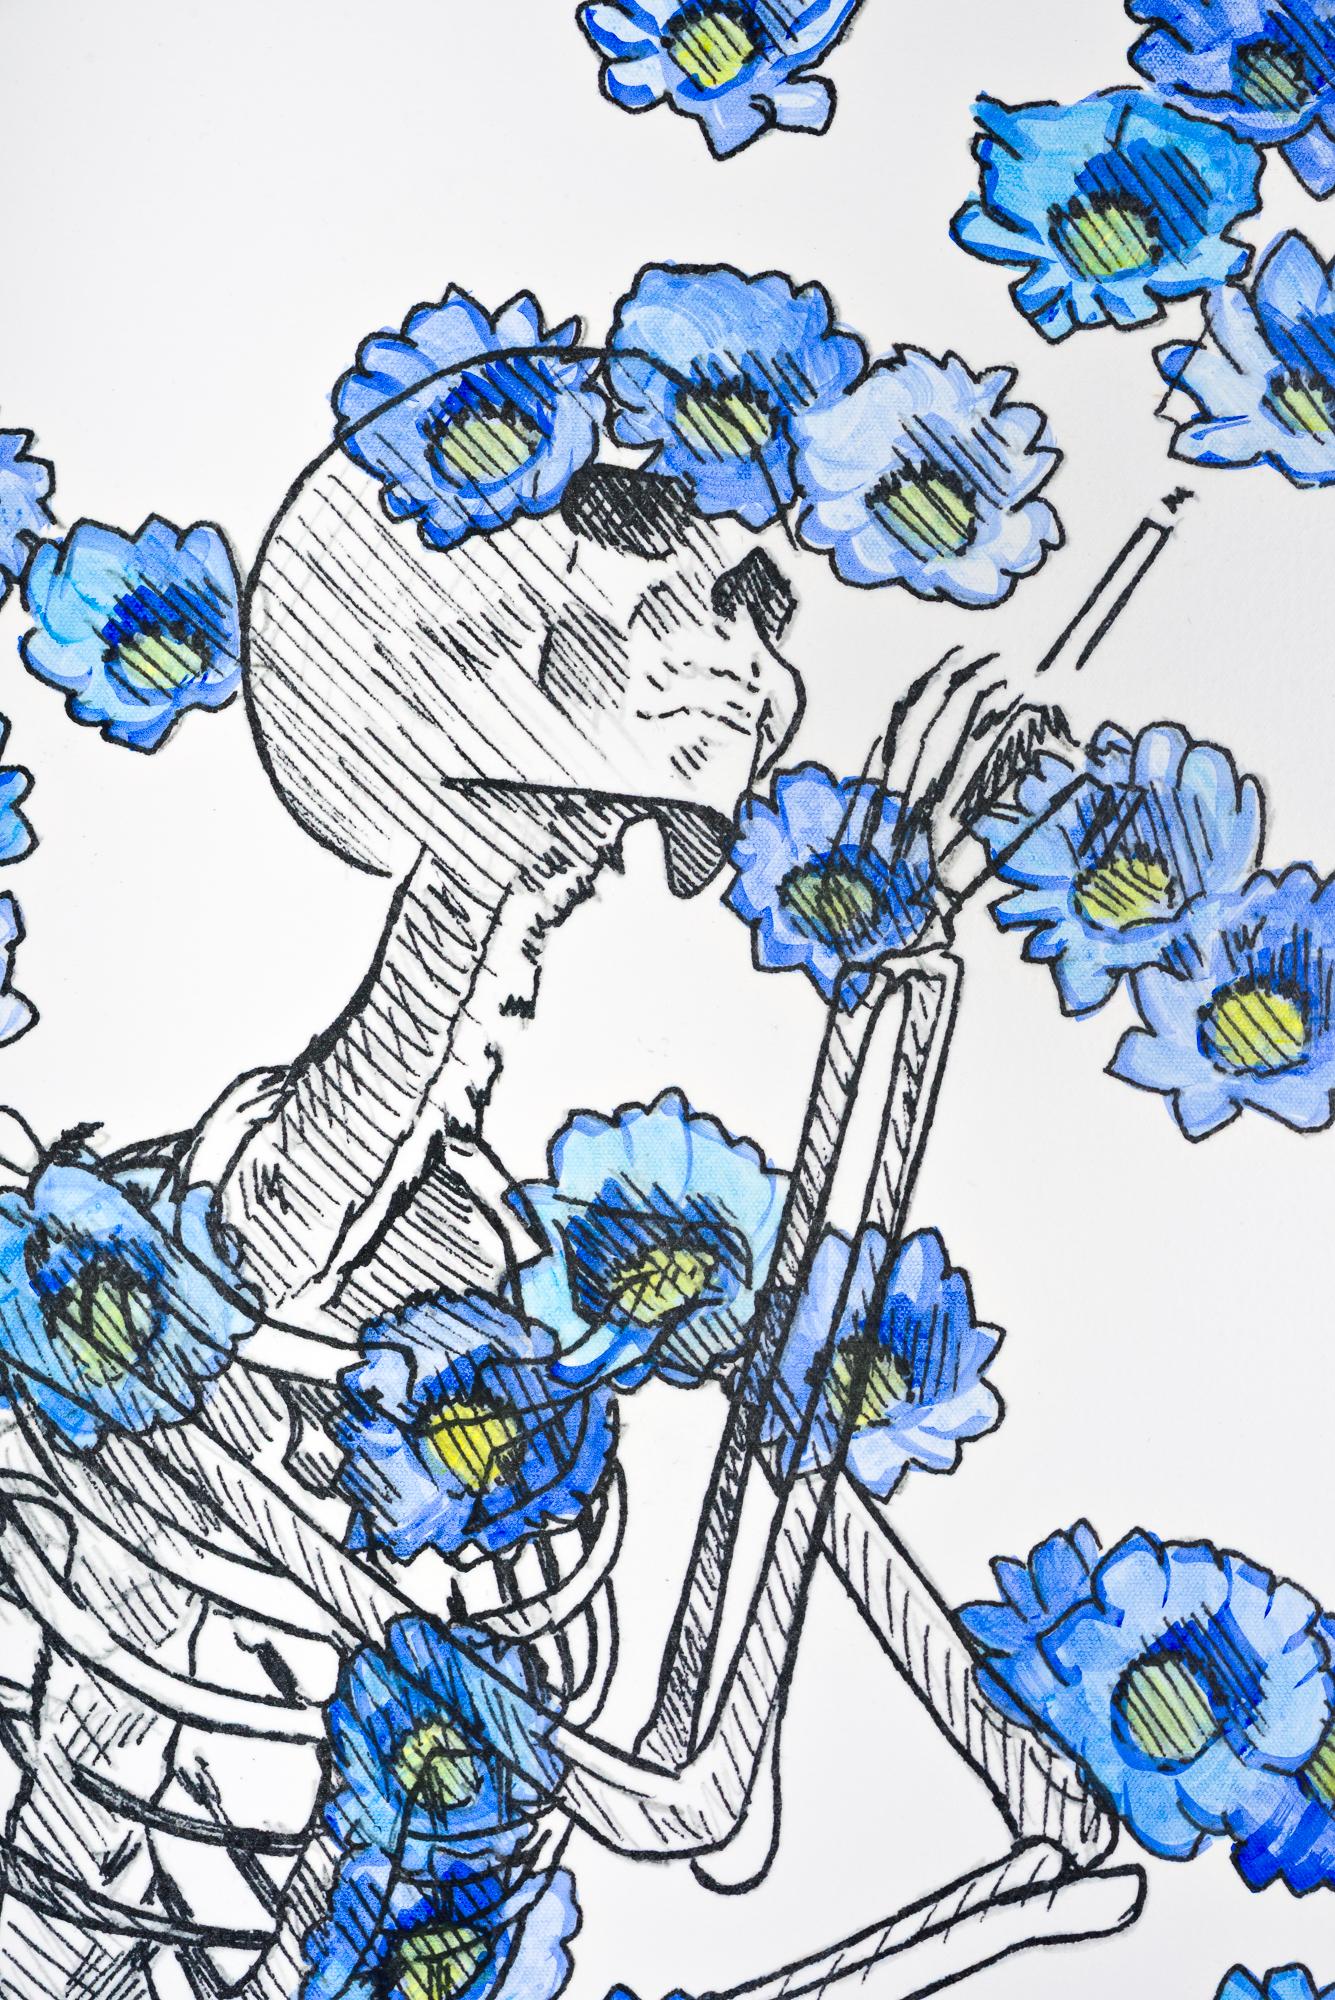 2019_03 - Mieke Marple-06.jpg